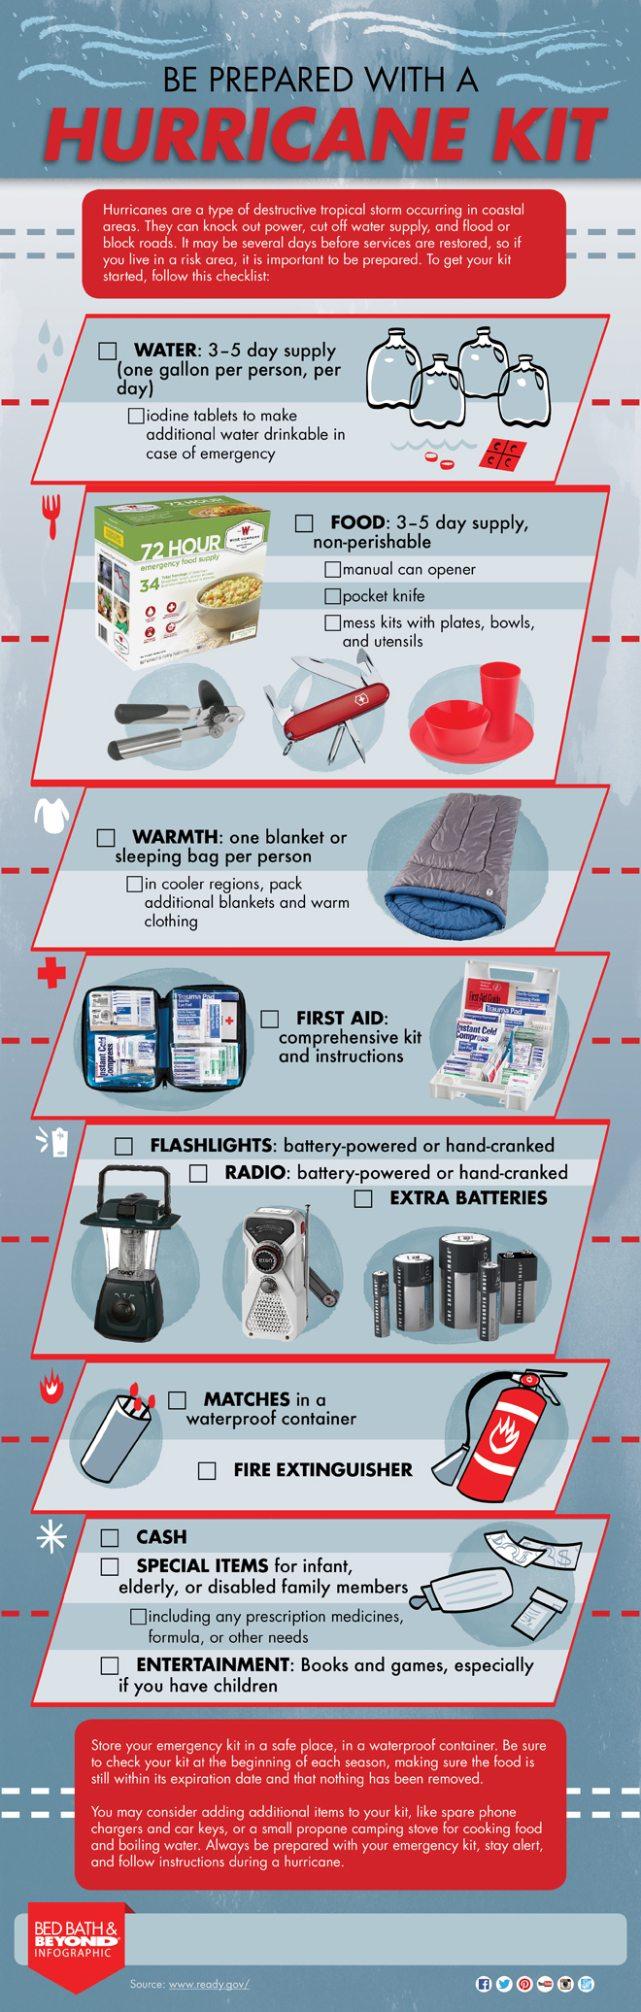 Hurricane Preparation List